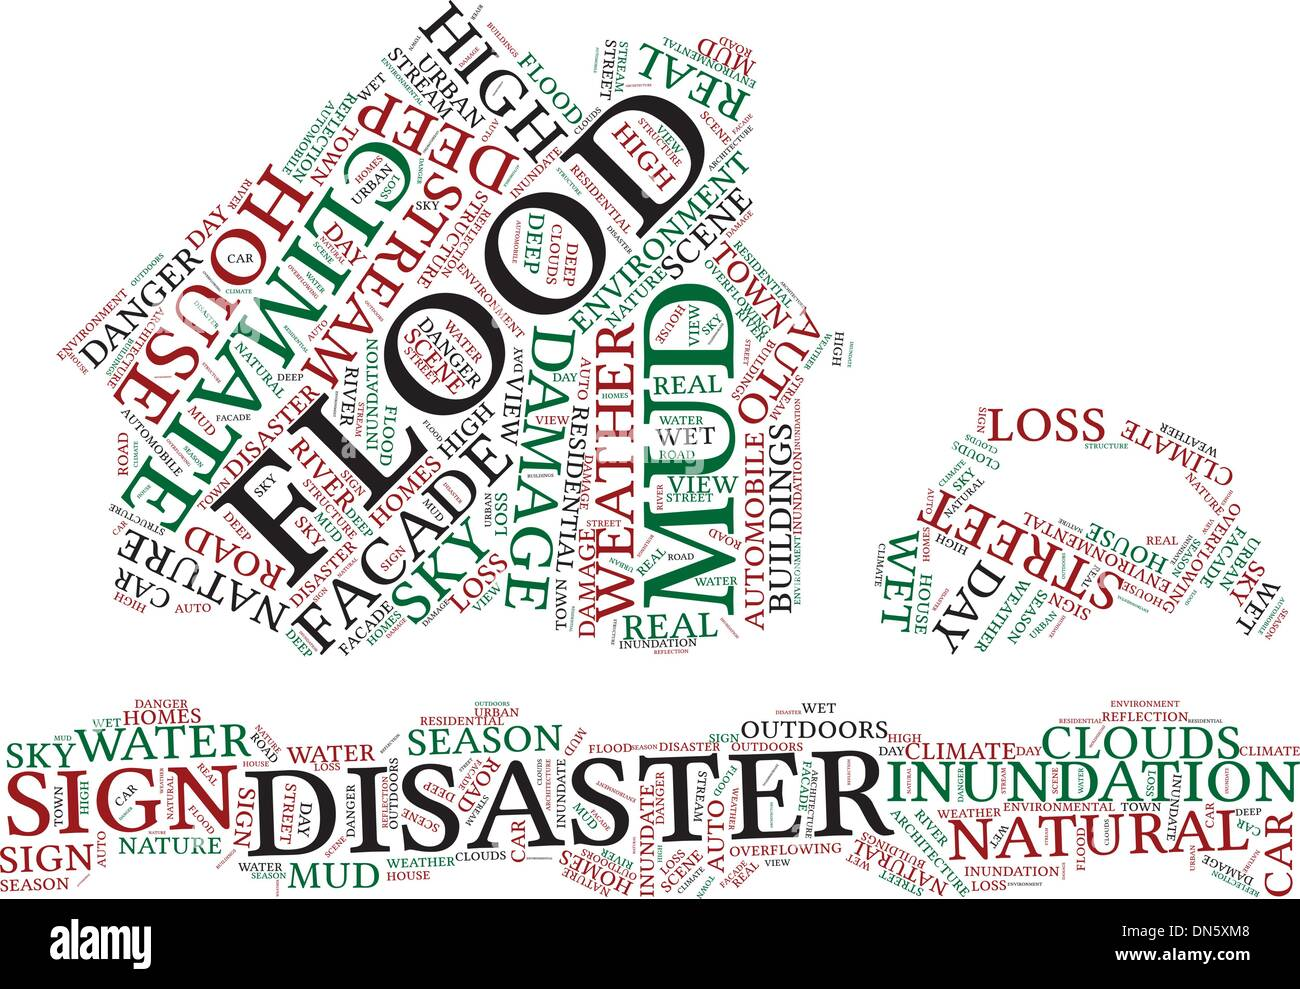 Symbol-Piktogramm-Vektor-Illustration zu überfluten. Stockbild